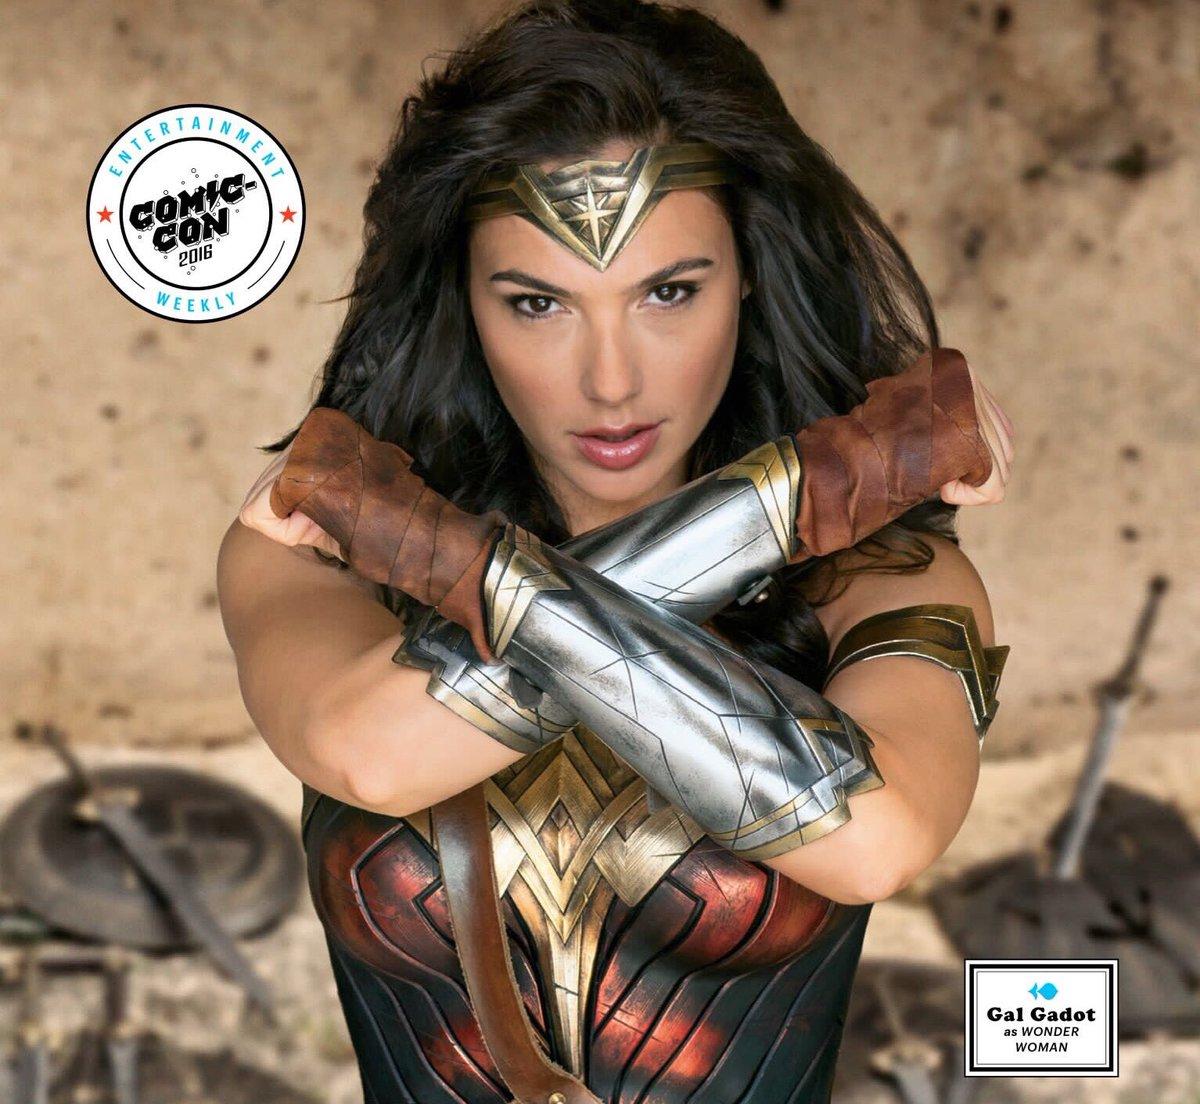 Wonder Woman Film Stills Comic Con